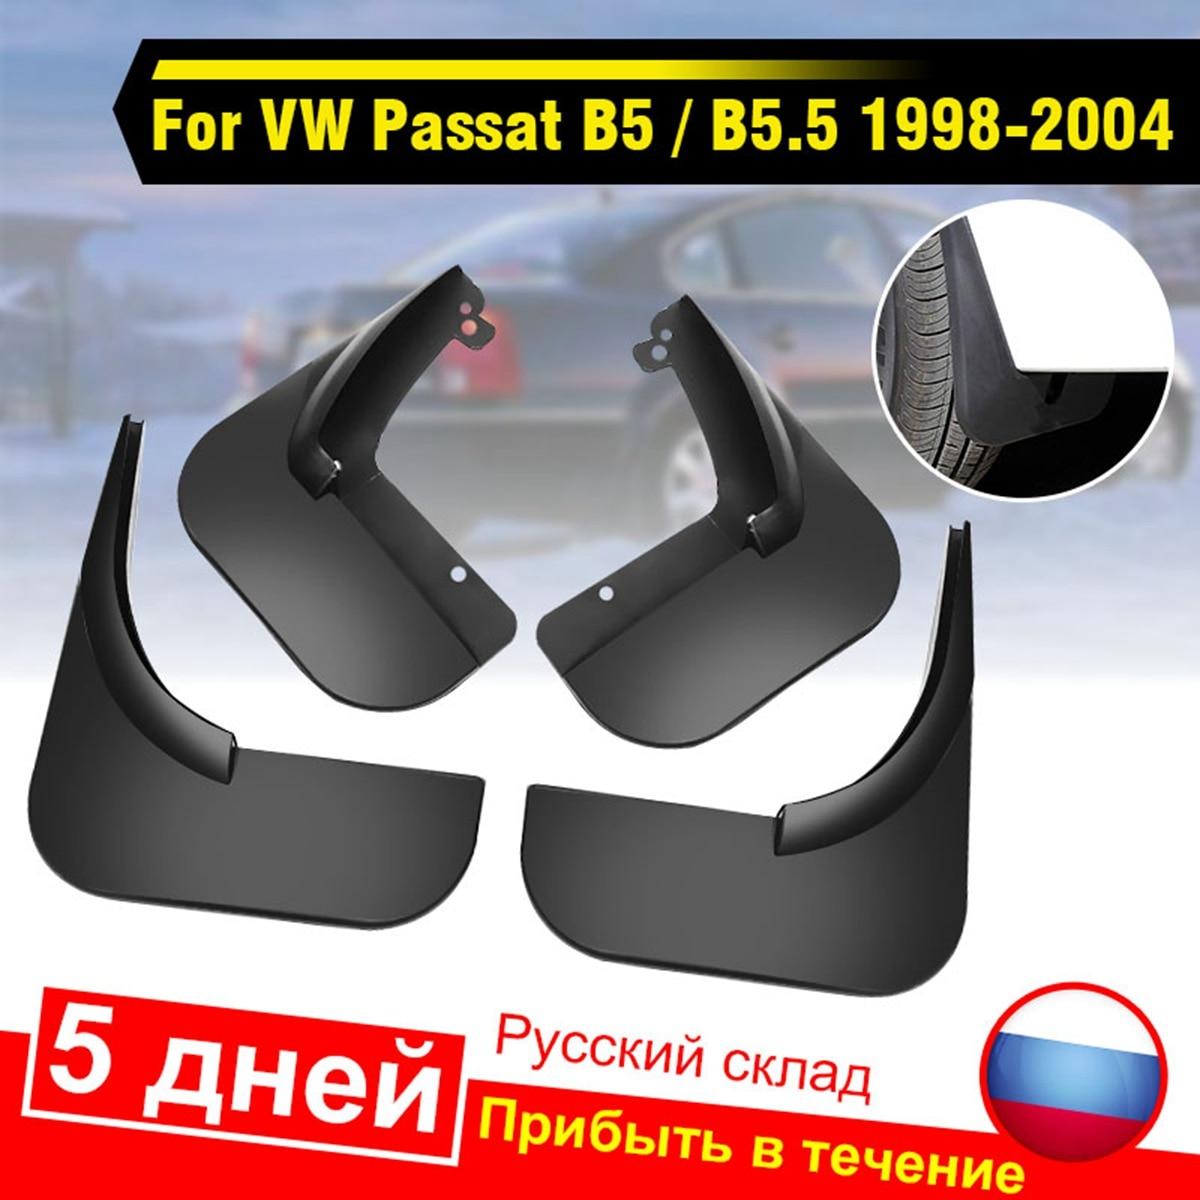 4Pcs รถด้านหลัง Mud FLAP Mudguards Splash Guards สำหรับ VW Passat B5/B5.5 1998-2004